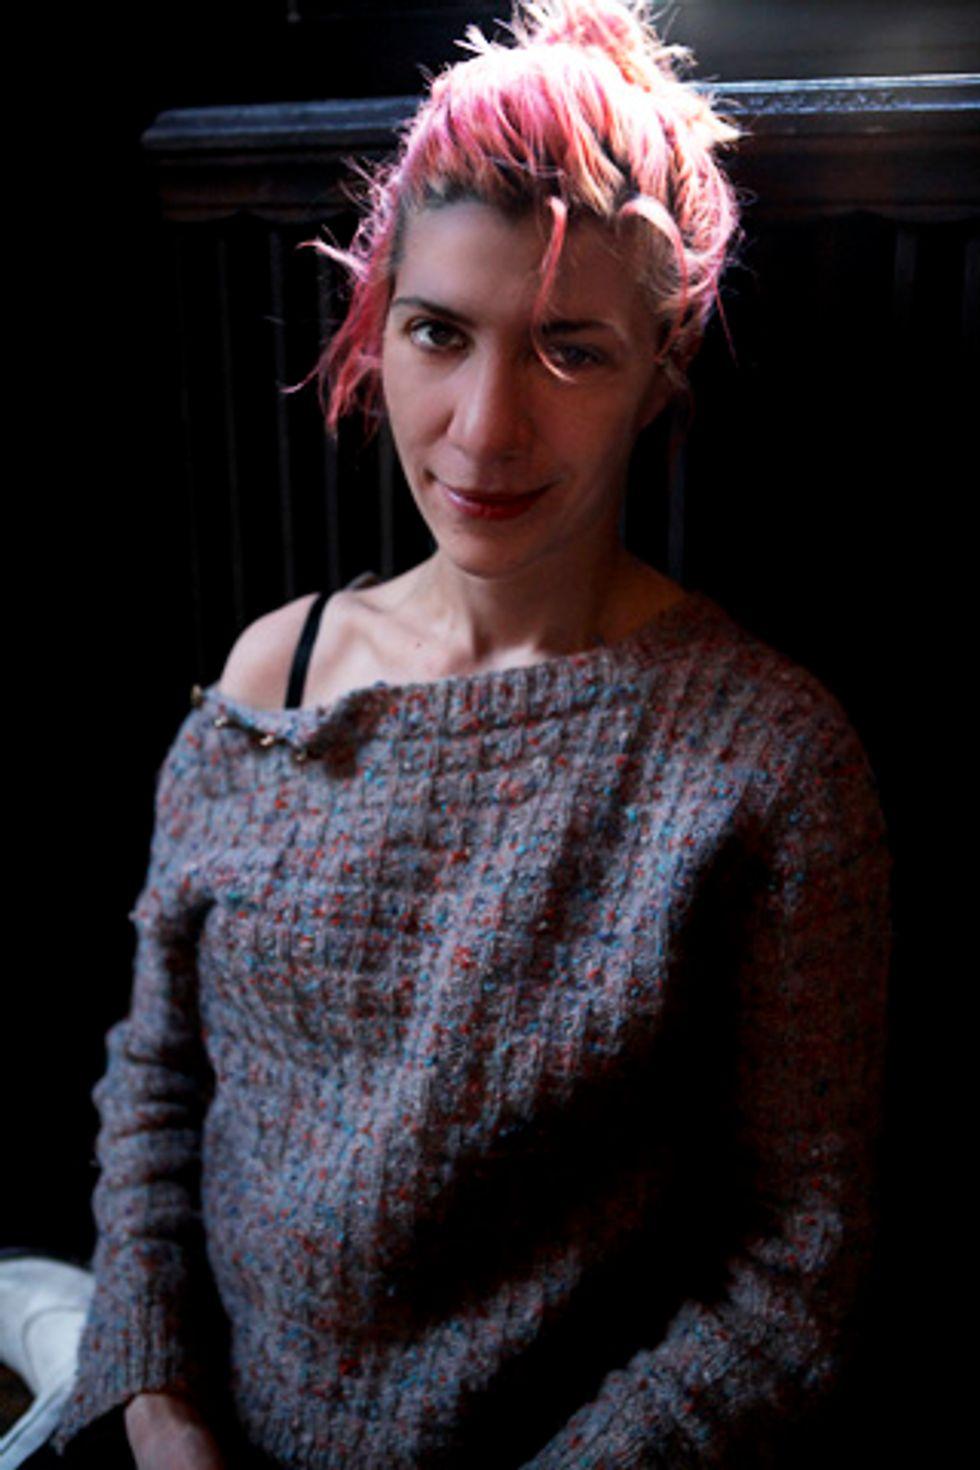 Artist Residency (Whitney Biennial Edition): Agathe Snow